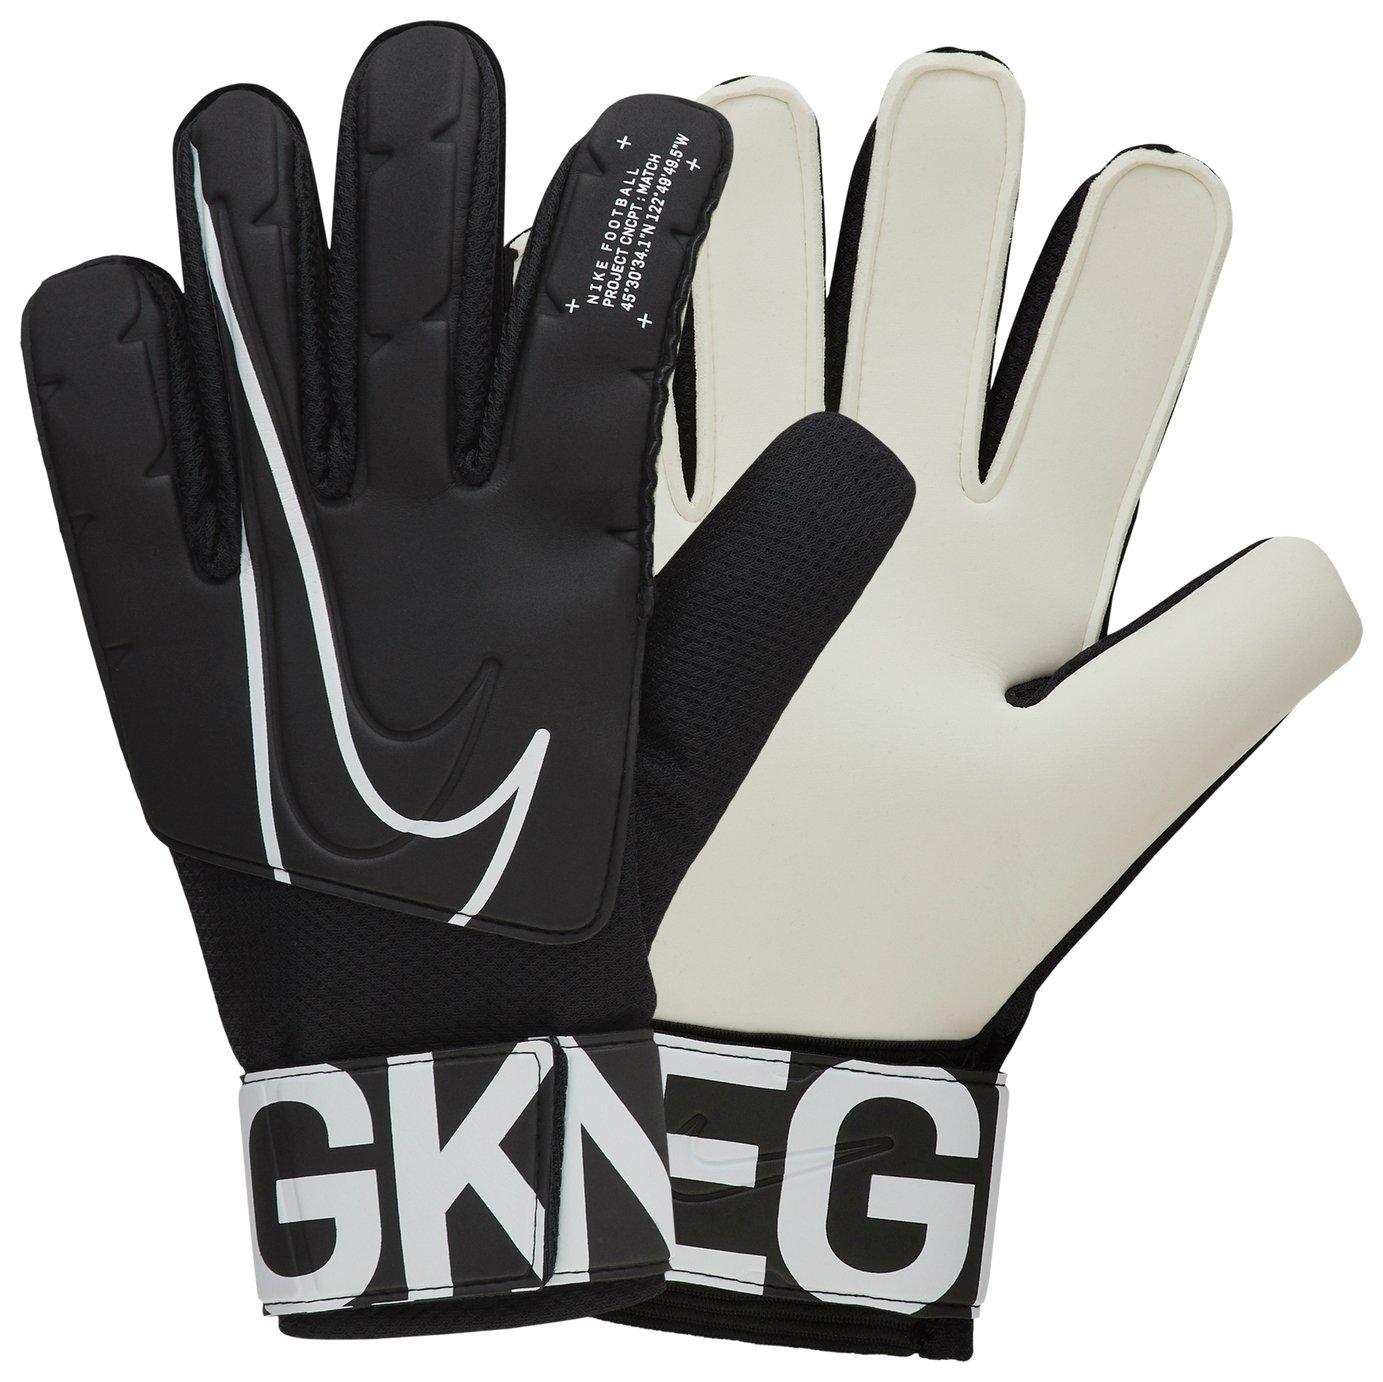 Nike Match Adult Goalkeeper Gloves